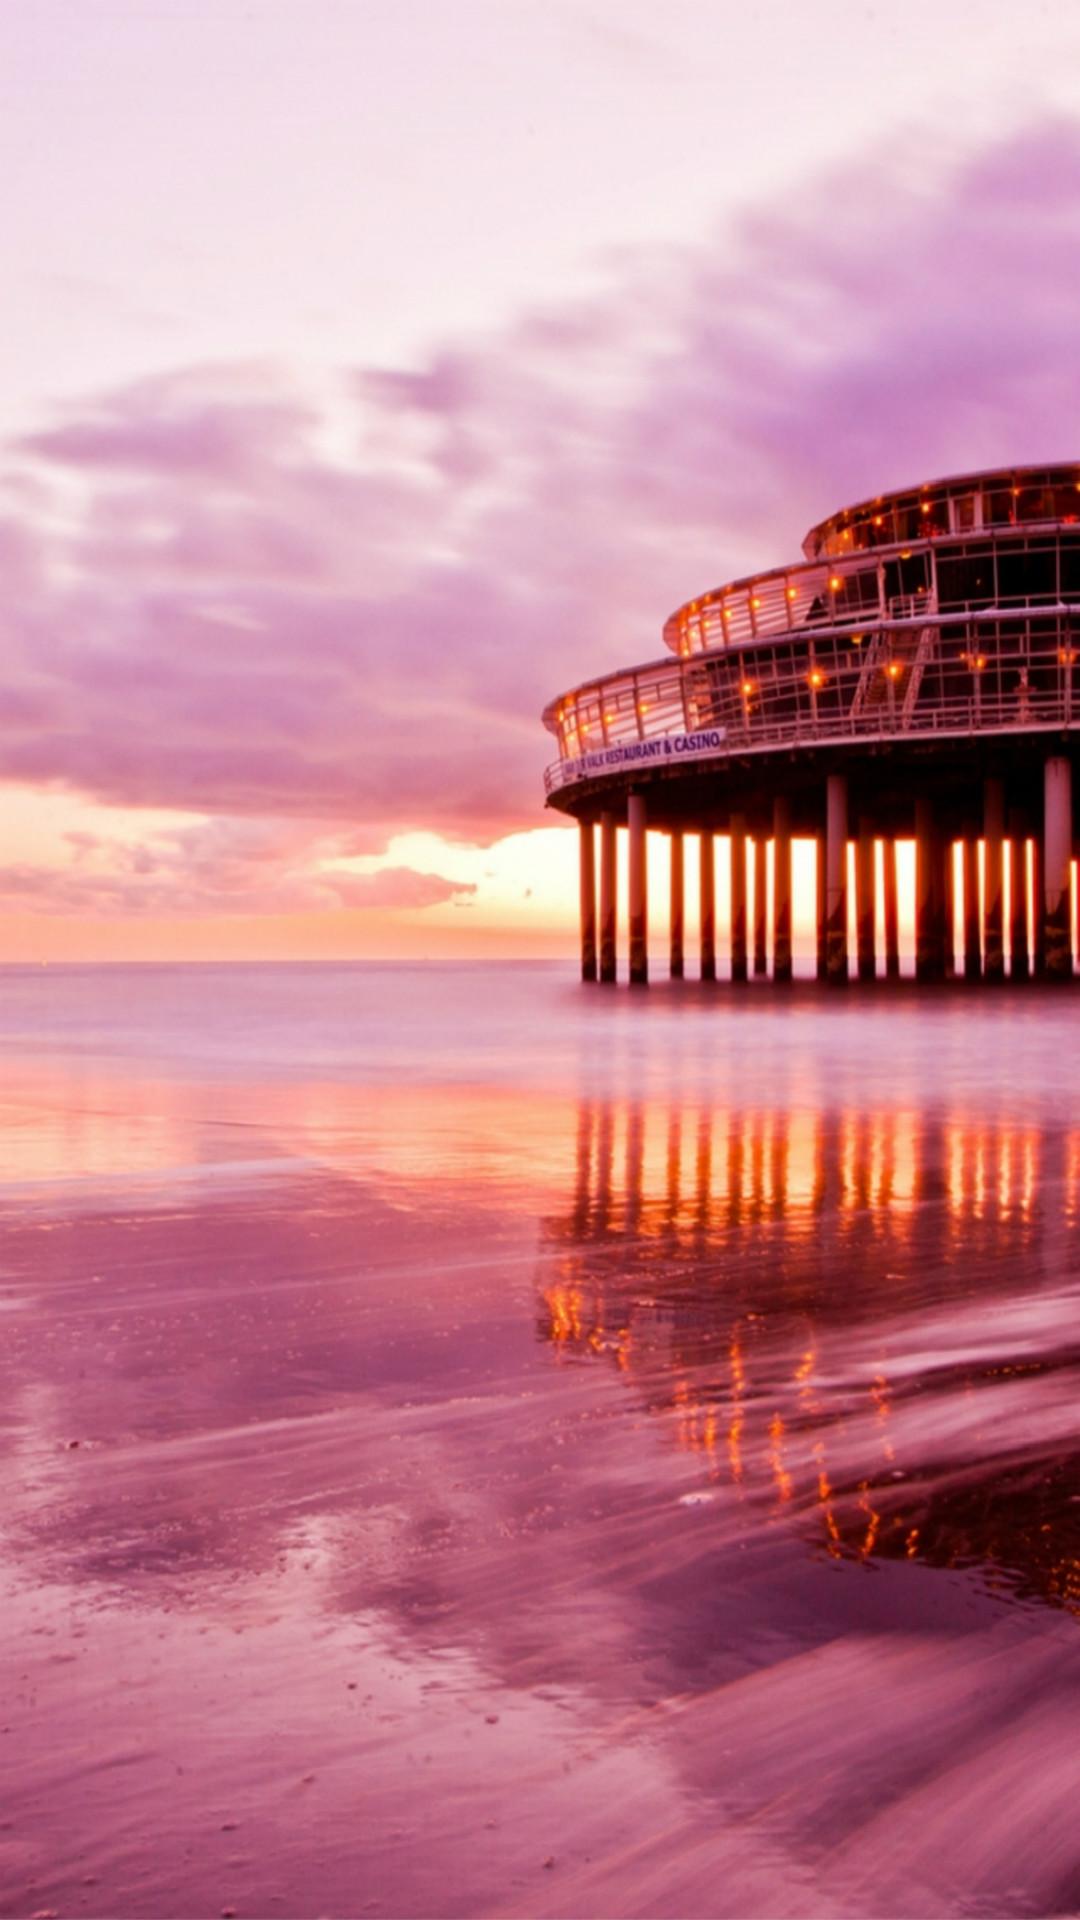 Spectacular Ocean Sunset Beach Architecture Landscape #iPhone #6 #wallpaper